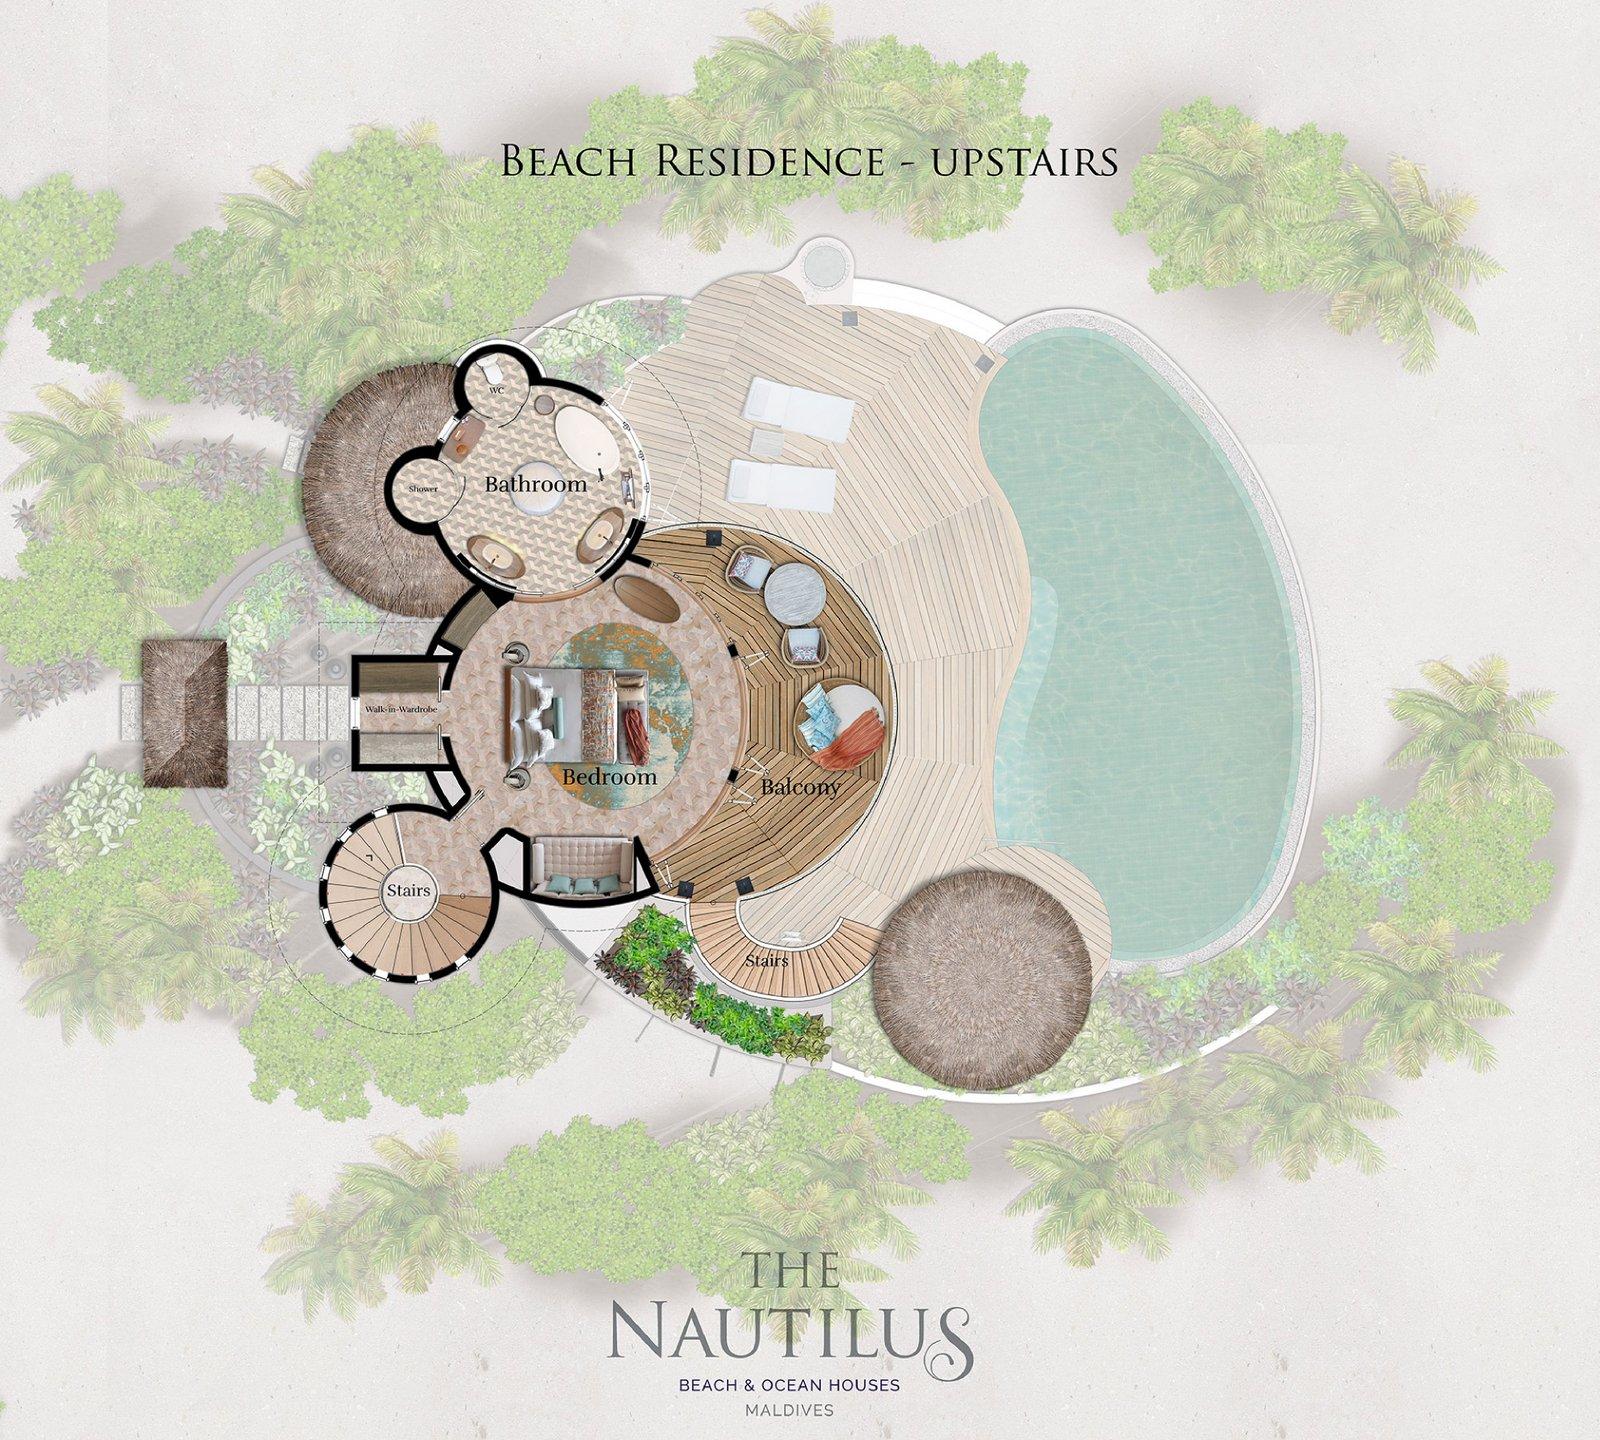 Мальдивы, отель The Nautilus Maldives, план-схема номера One-Bedroom Beach Residence